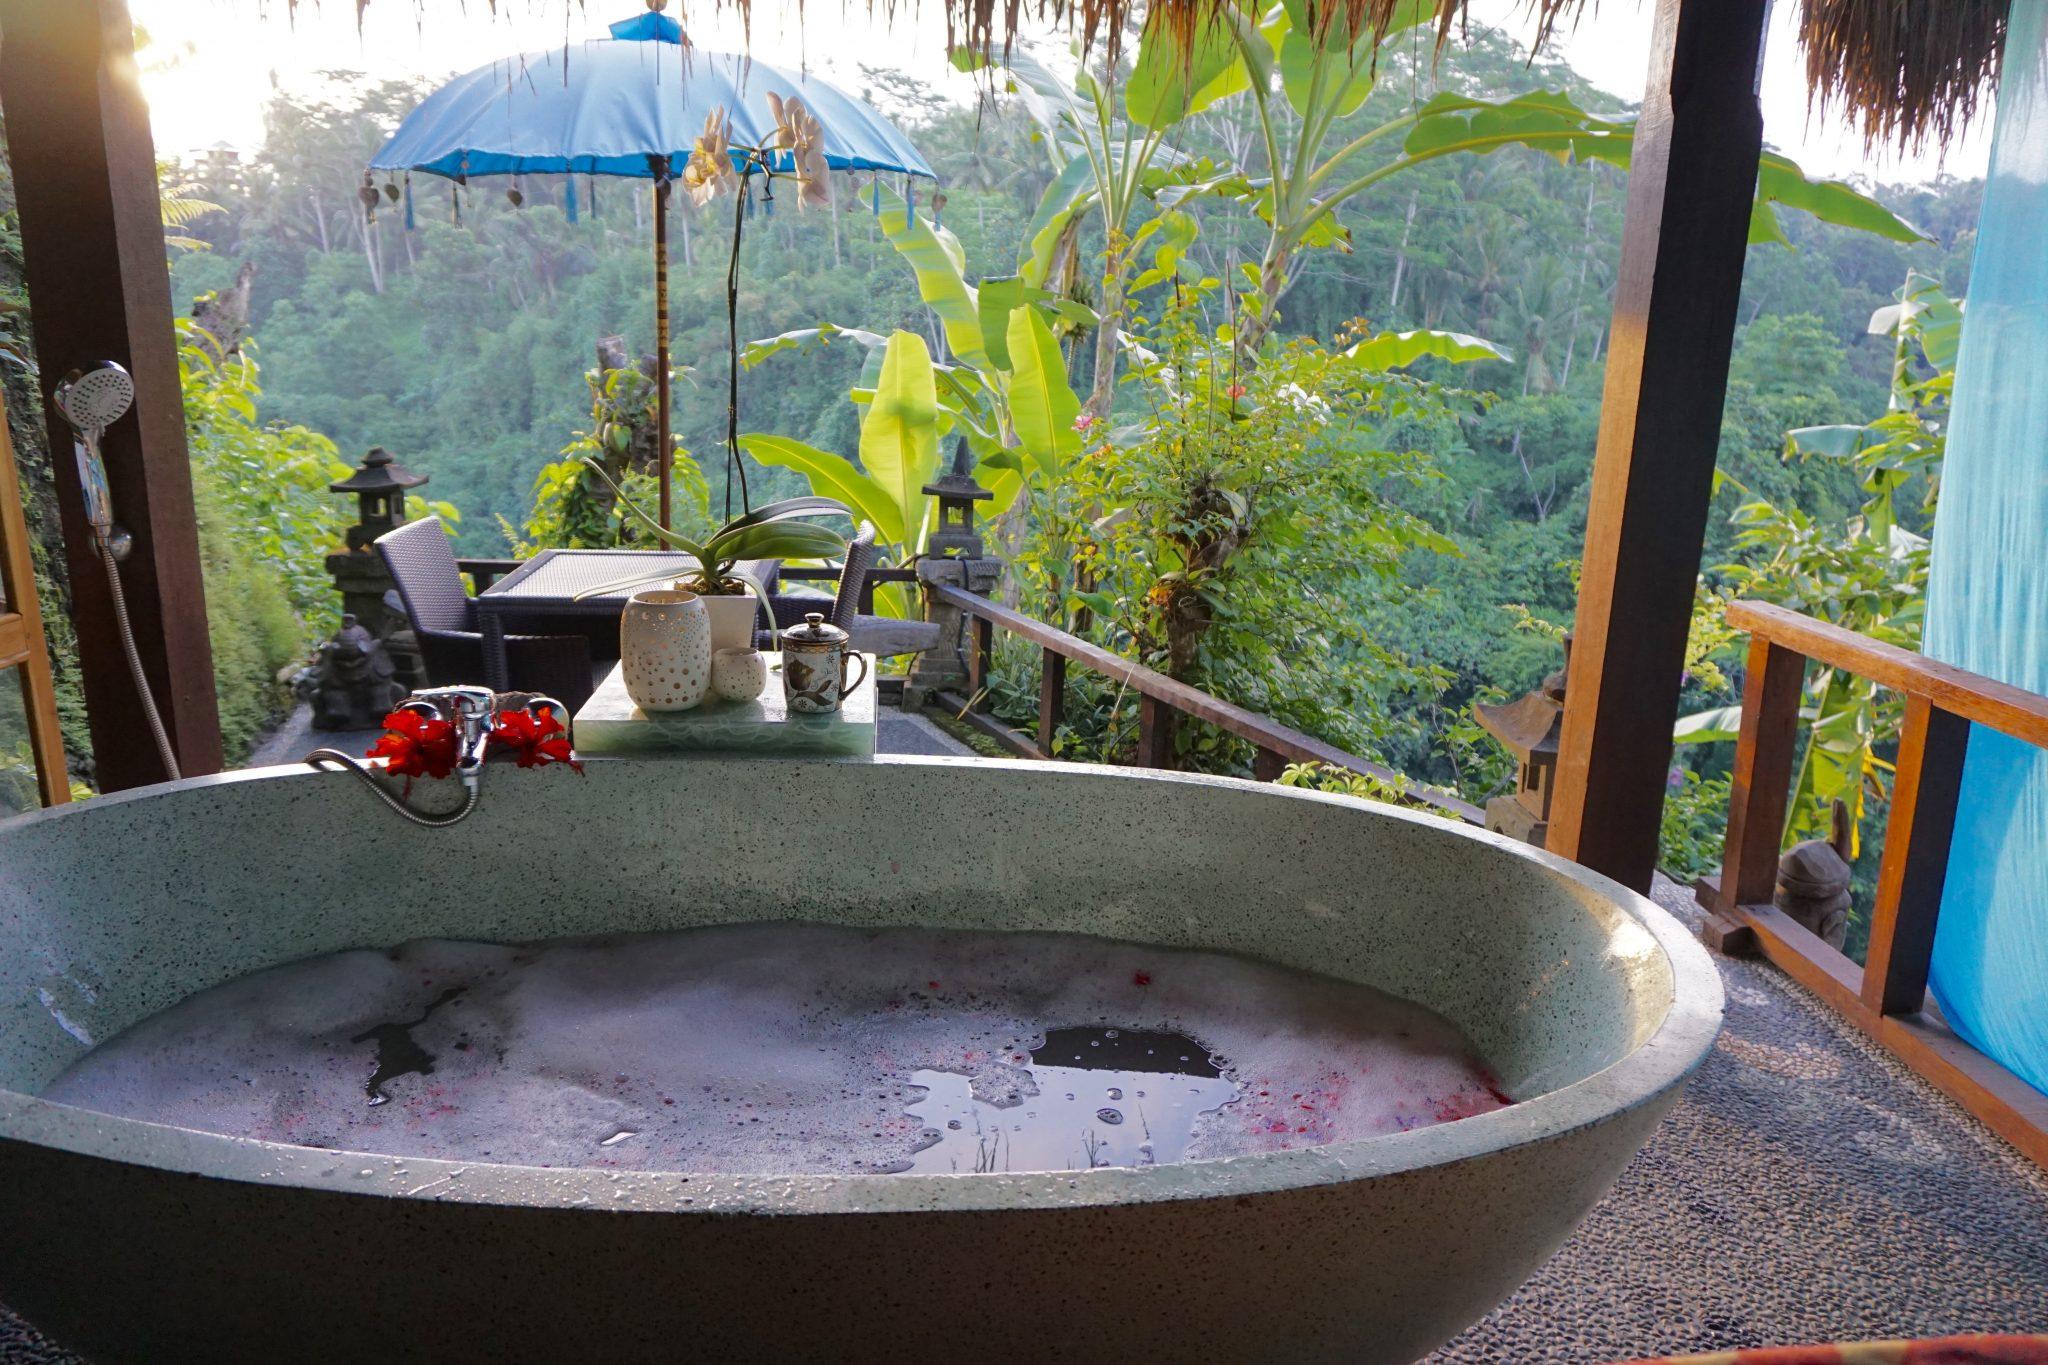 bali, indonesia, ubud, spa, villa kalisat, bali bathtub, bali spa, ubud spa, flower petals